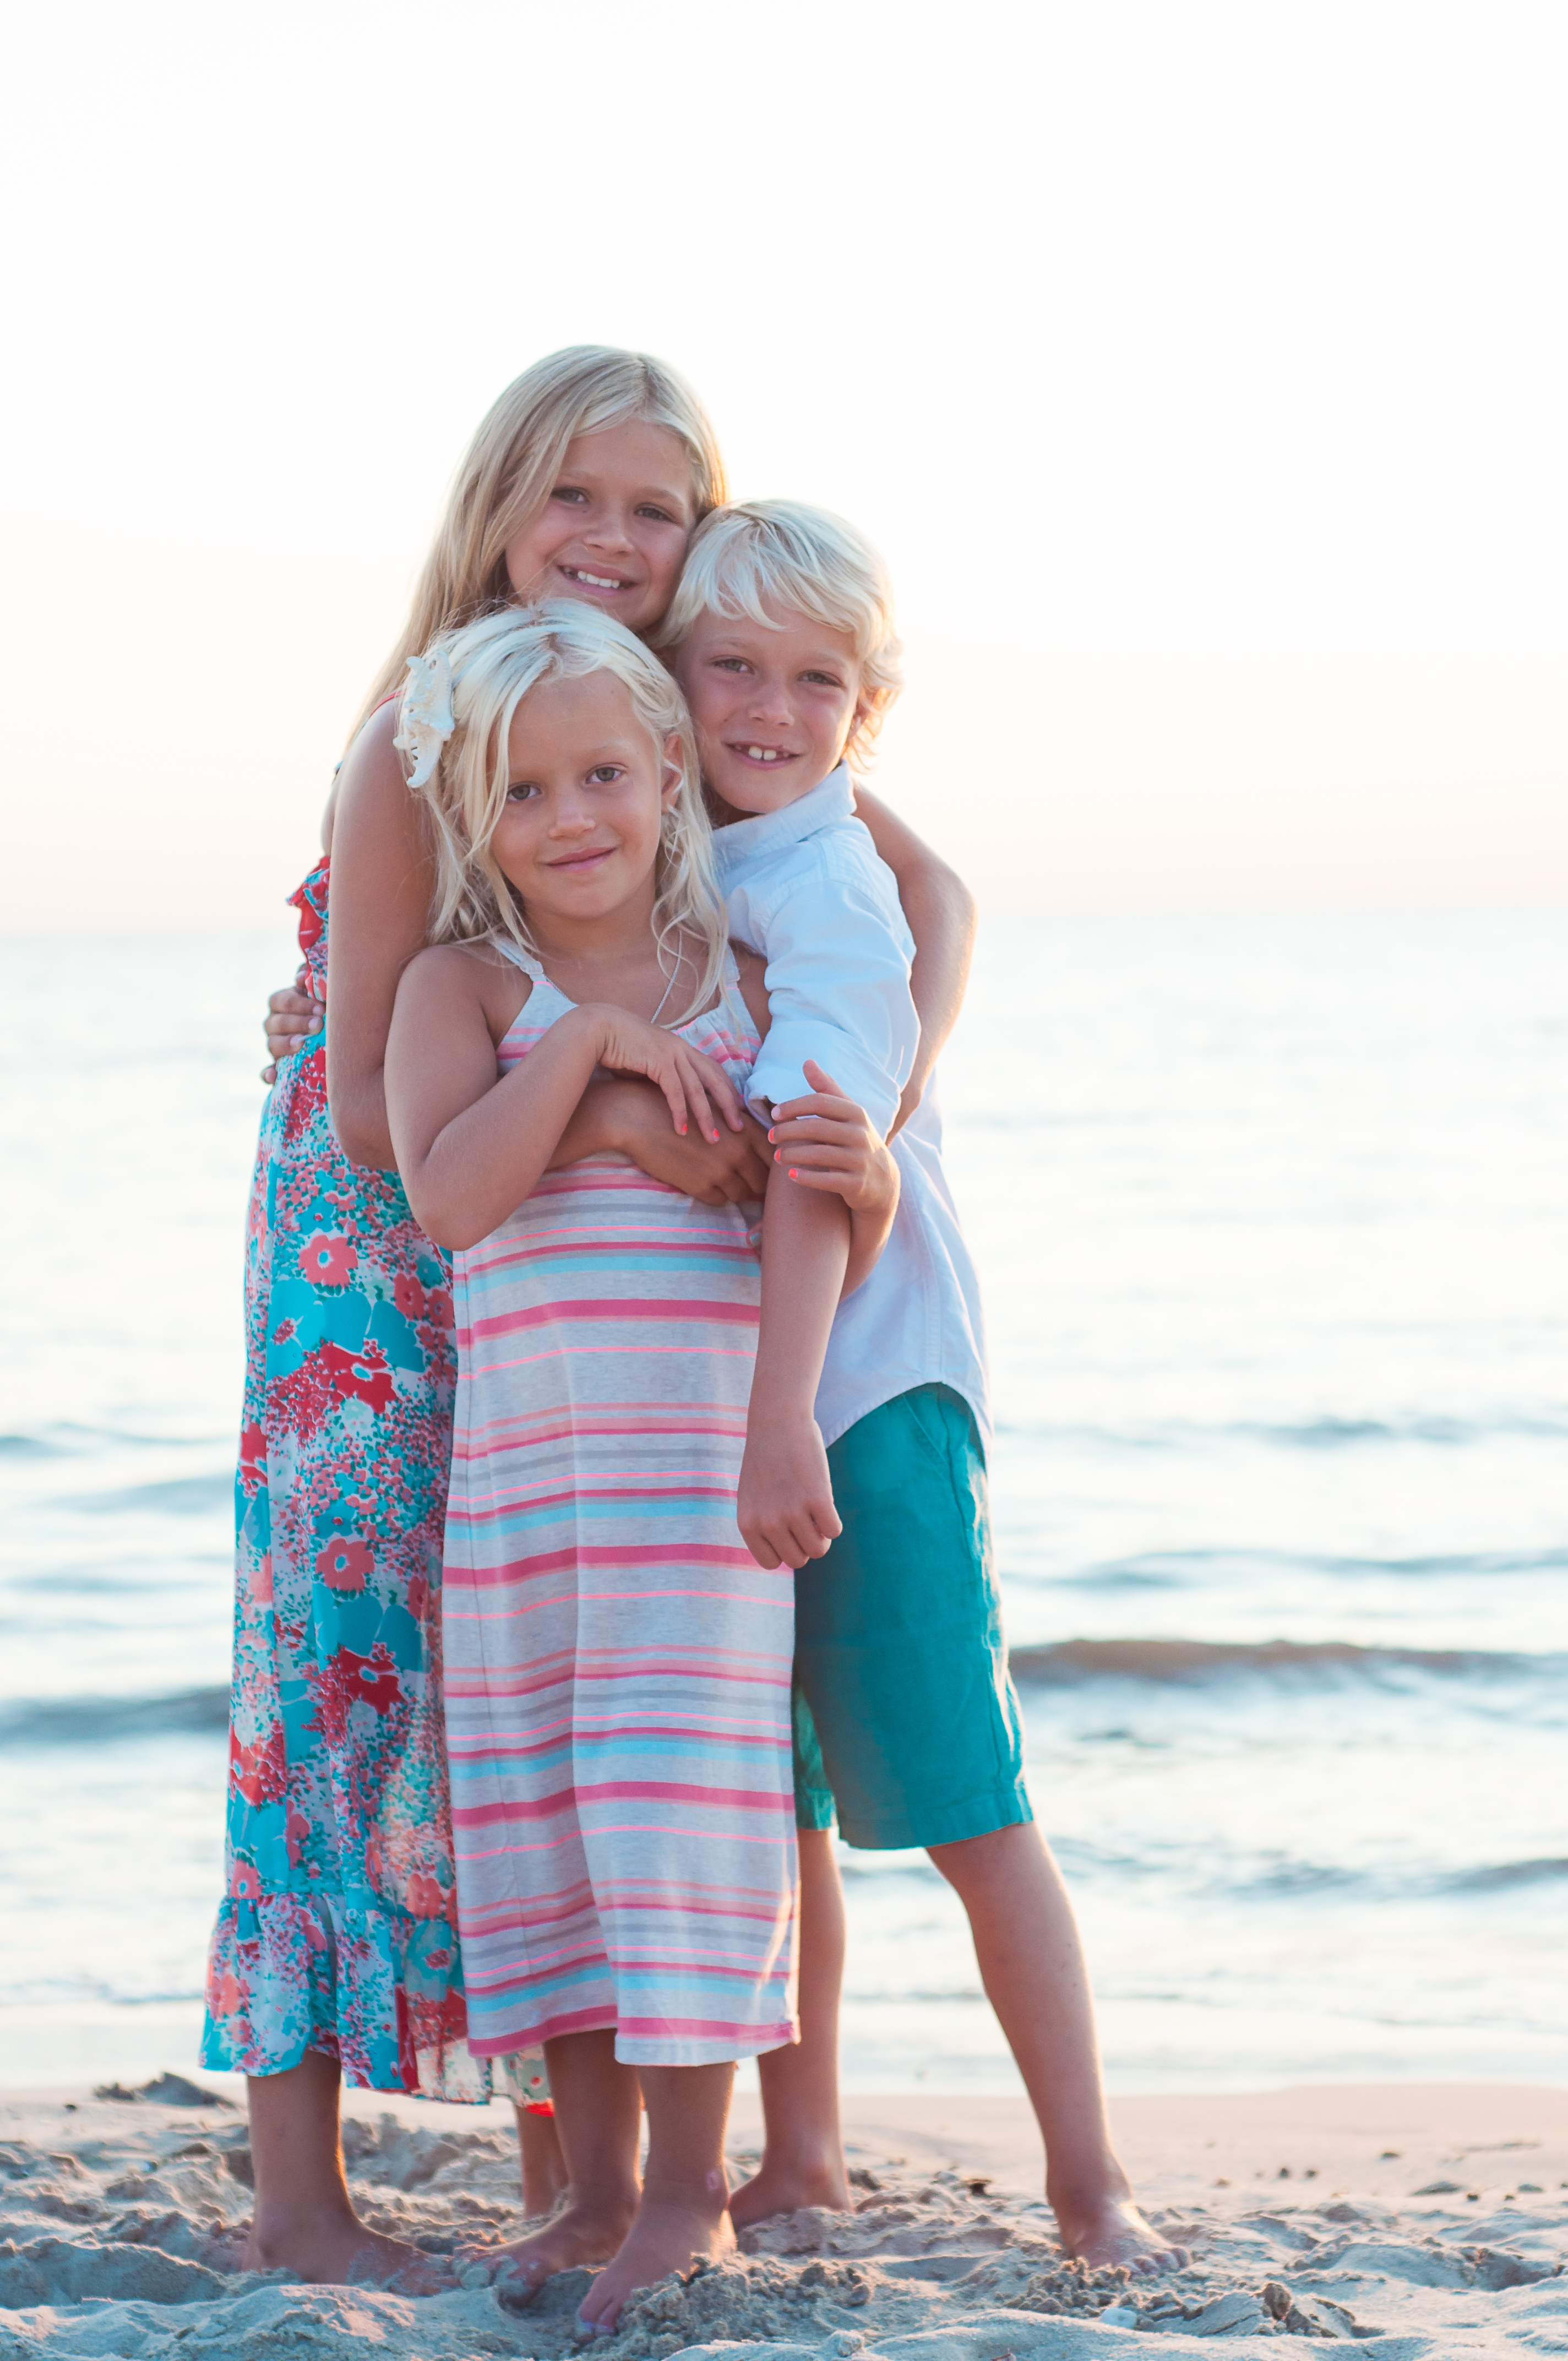 Family Beach Photos Best Family Beach Photography In Cape May Nj